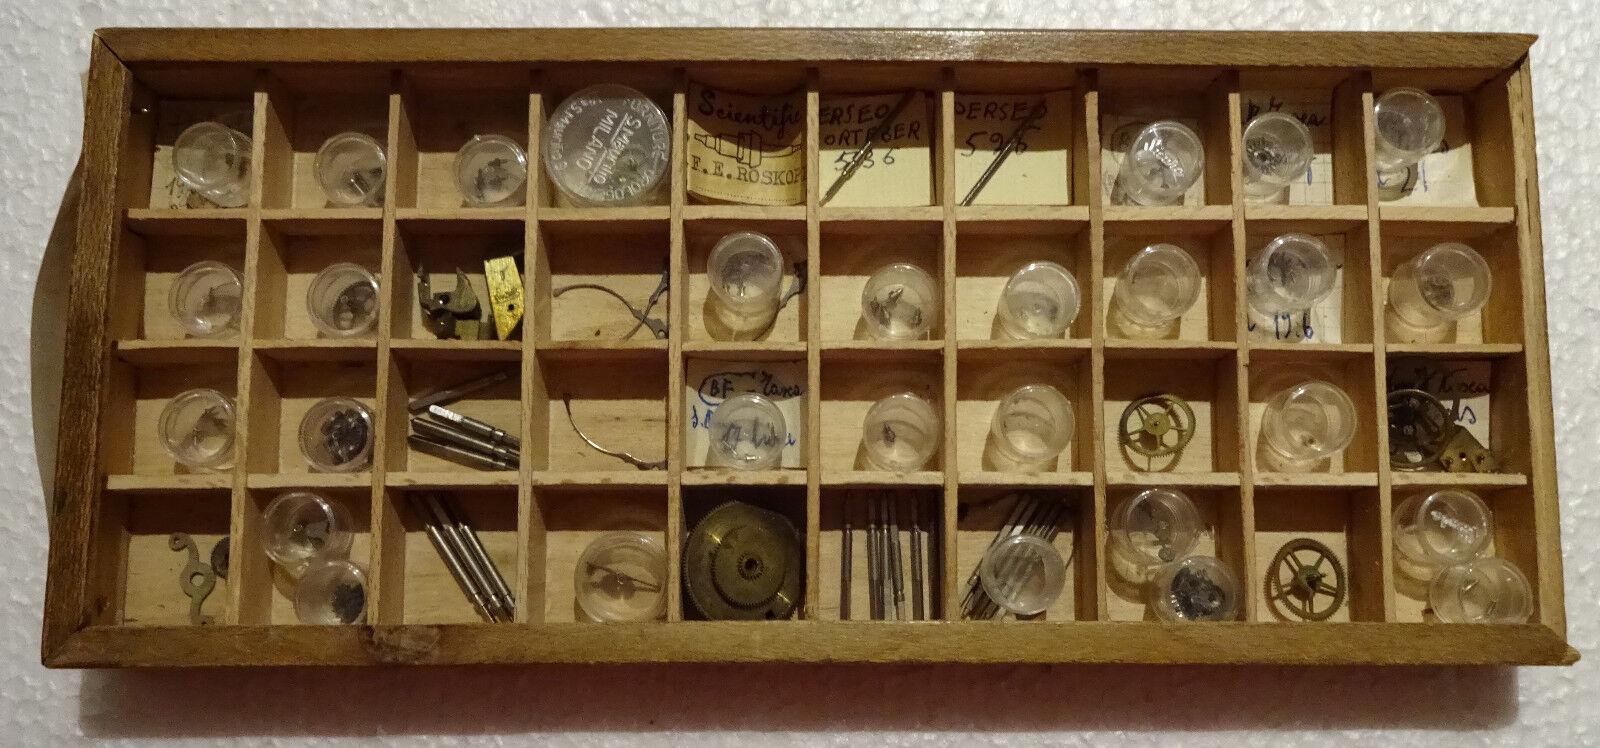 Repuestos Relojes Antiguos Set-Roskopf Repuestos